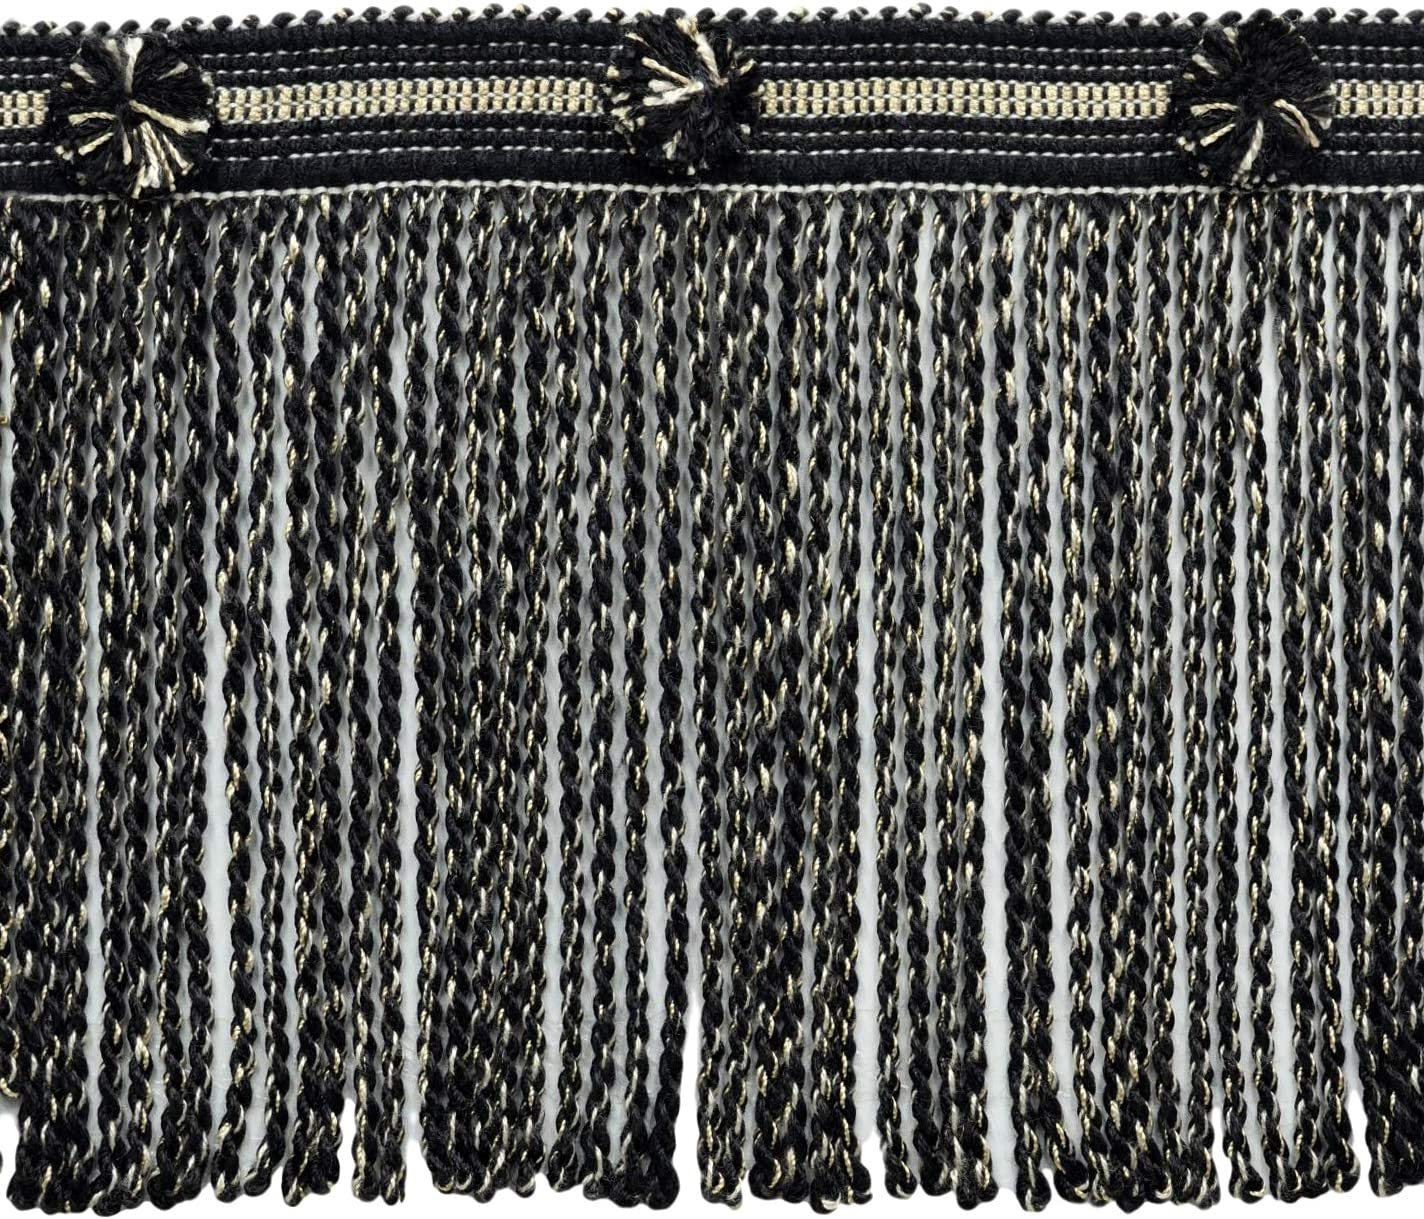 Sold by The Yard Sandstone Bullion Fringe Trim|Style# BFHR6|Color: Noir Beige D/ÉCOPRO 6 Inch Long Black 21775